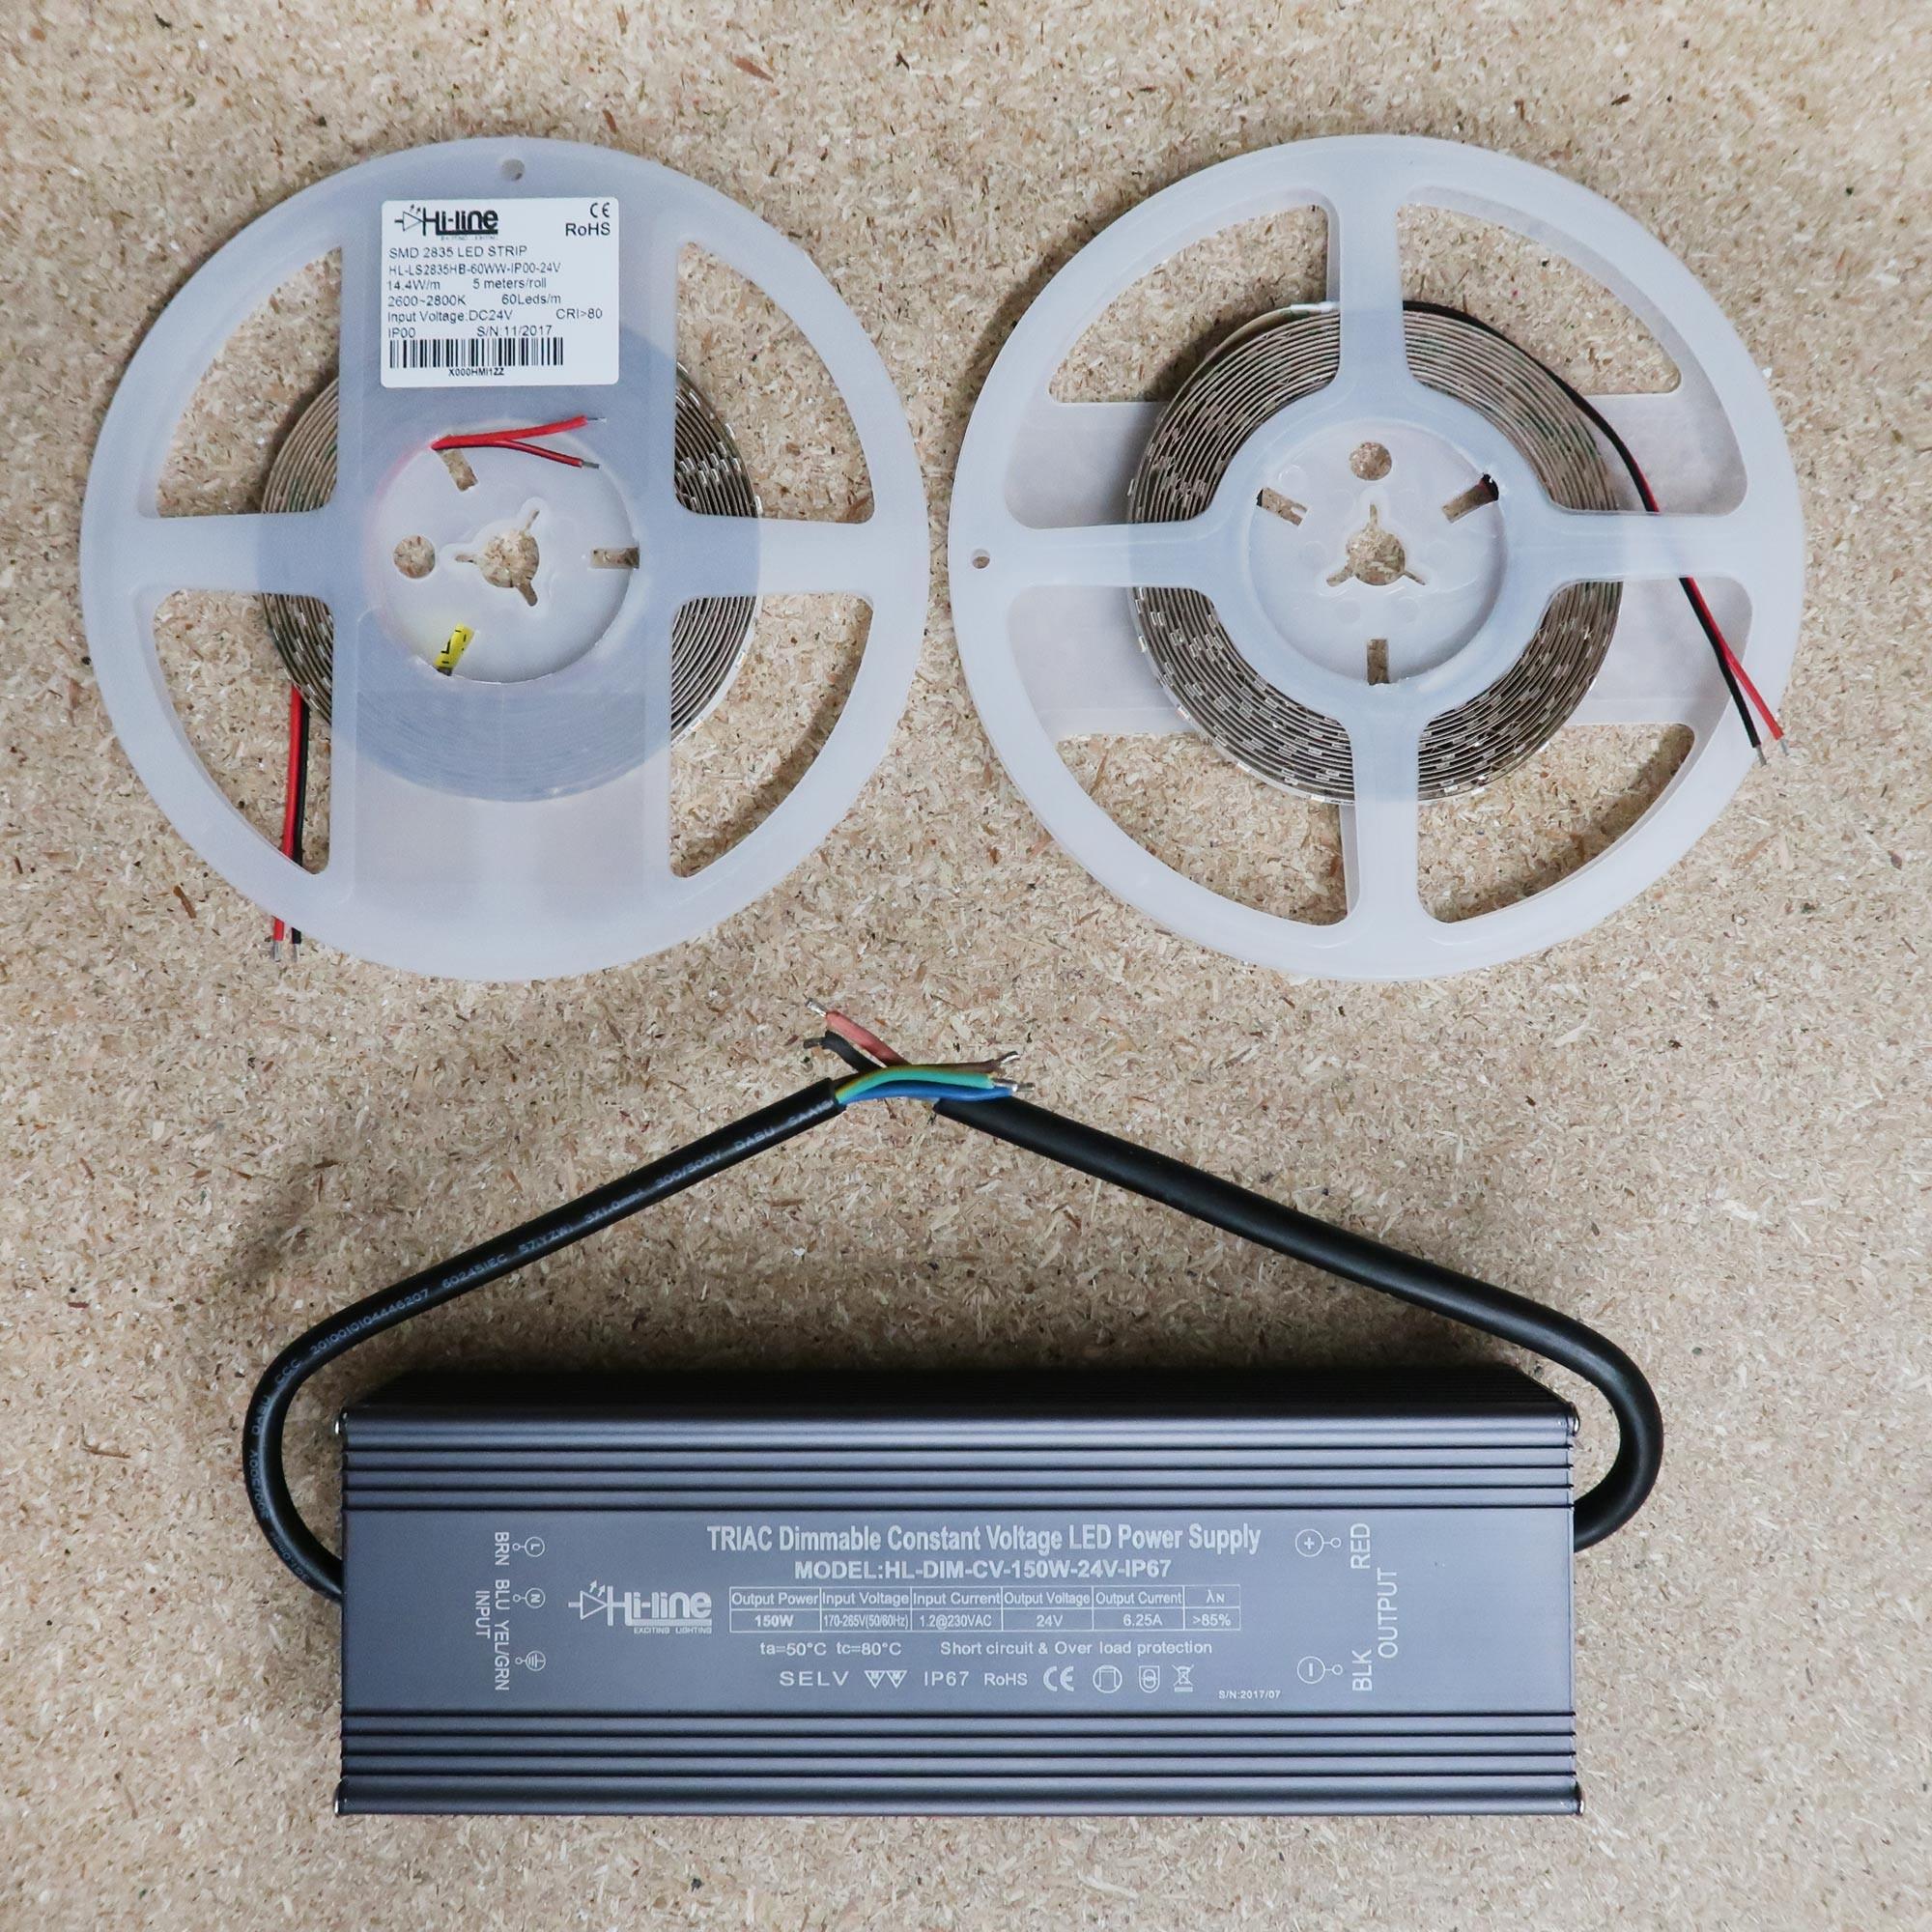 Mains Dimmable Warm White Led Strip Kit 10m Driver Dimming Power Supply Dimmer For 12v 24v